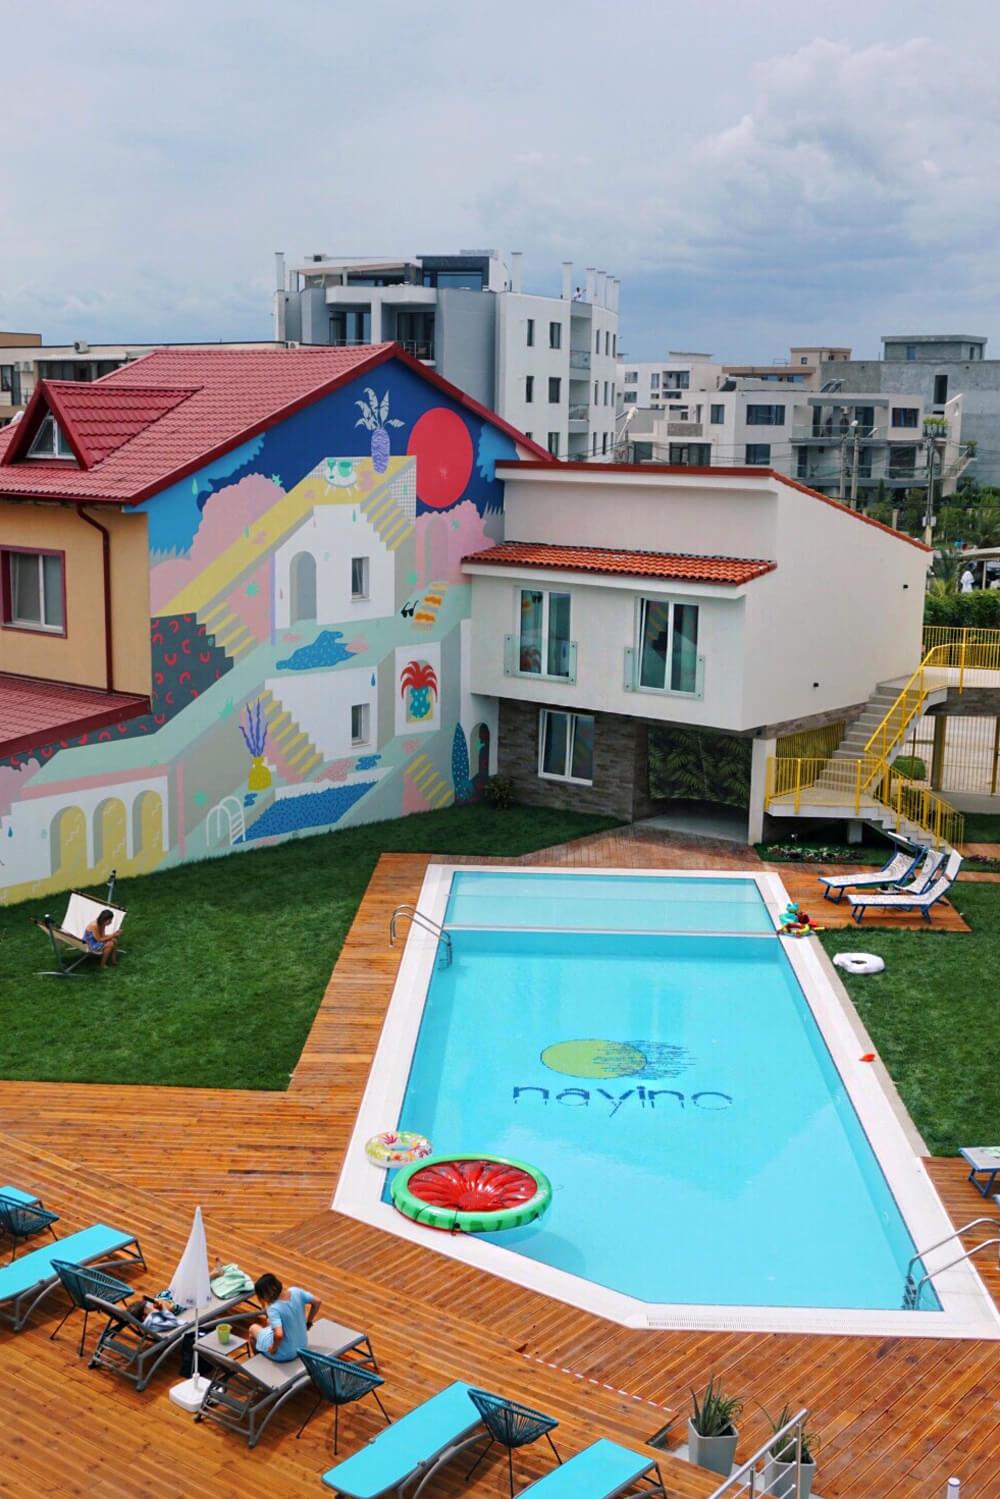 sandra stoicovici nayino resort